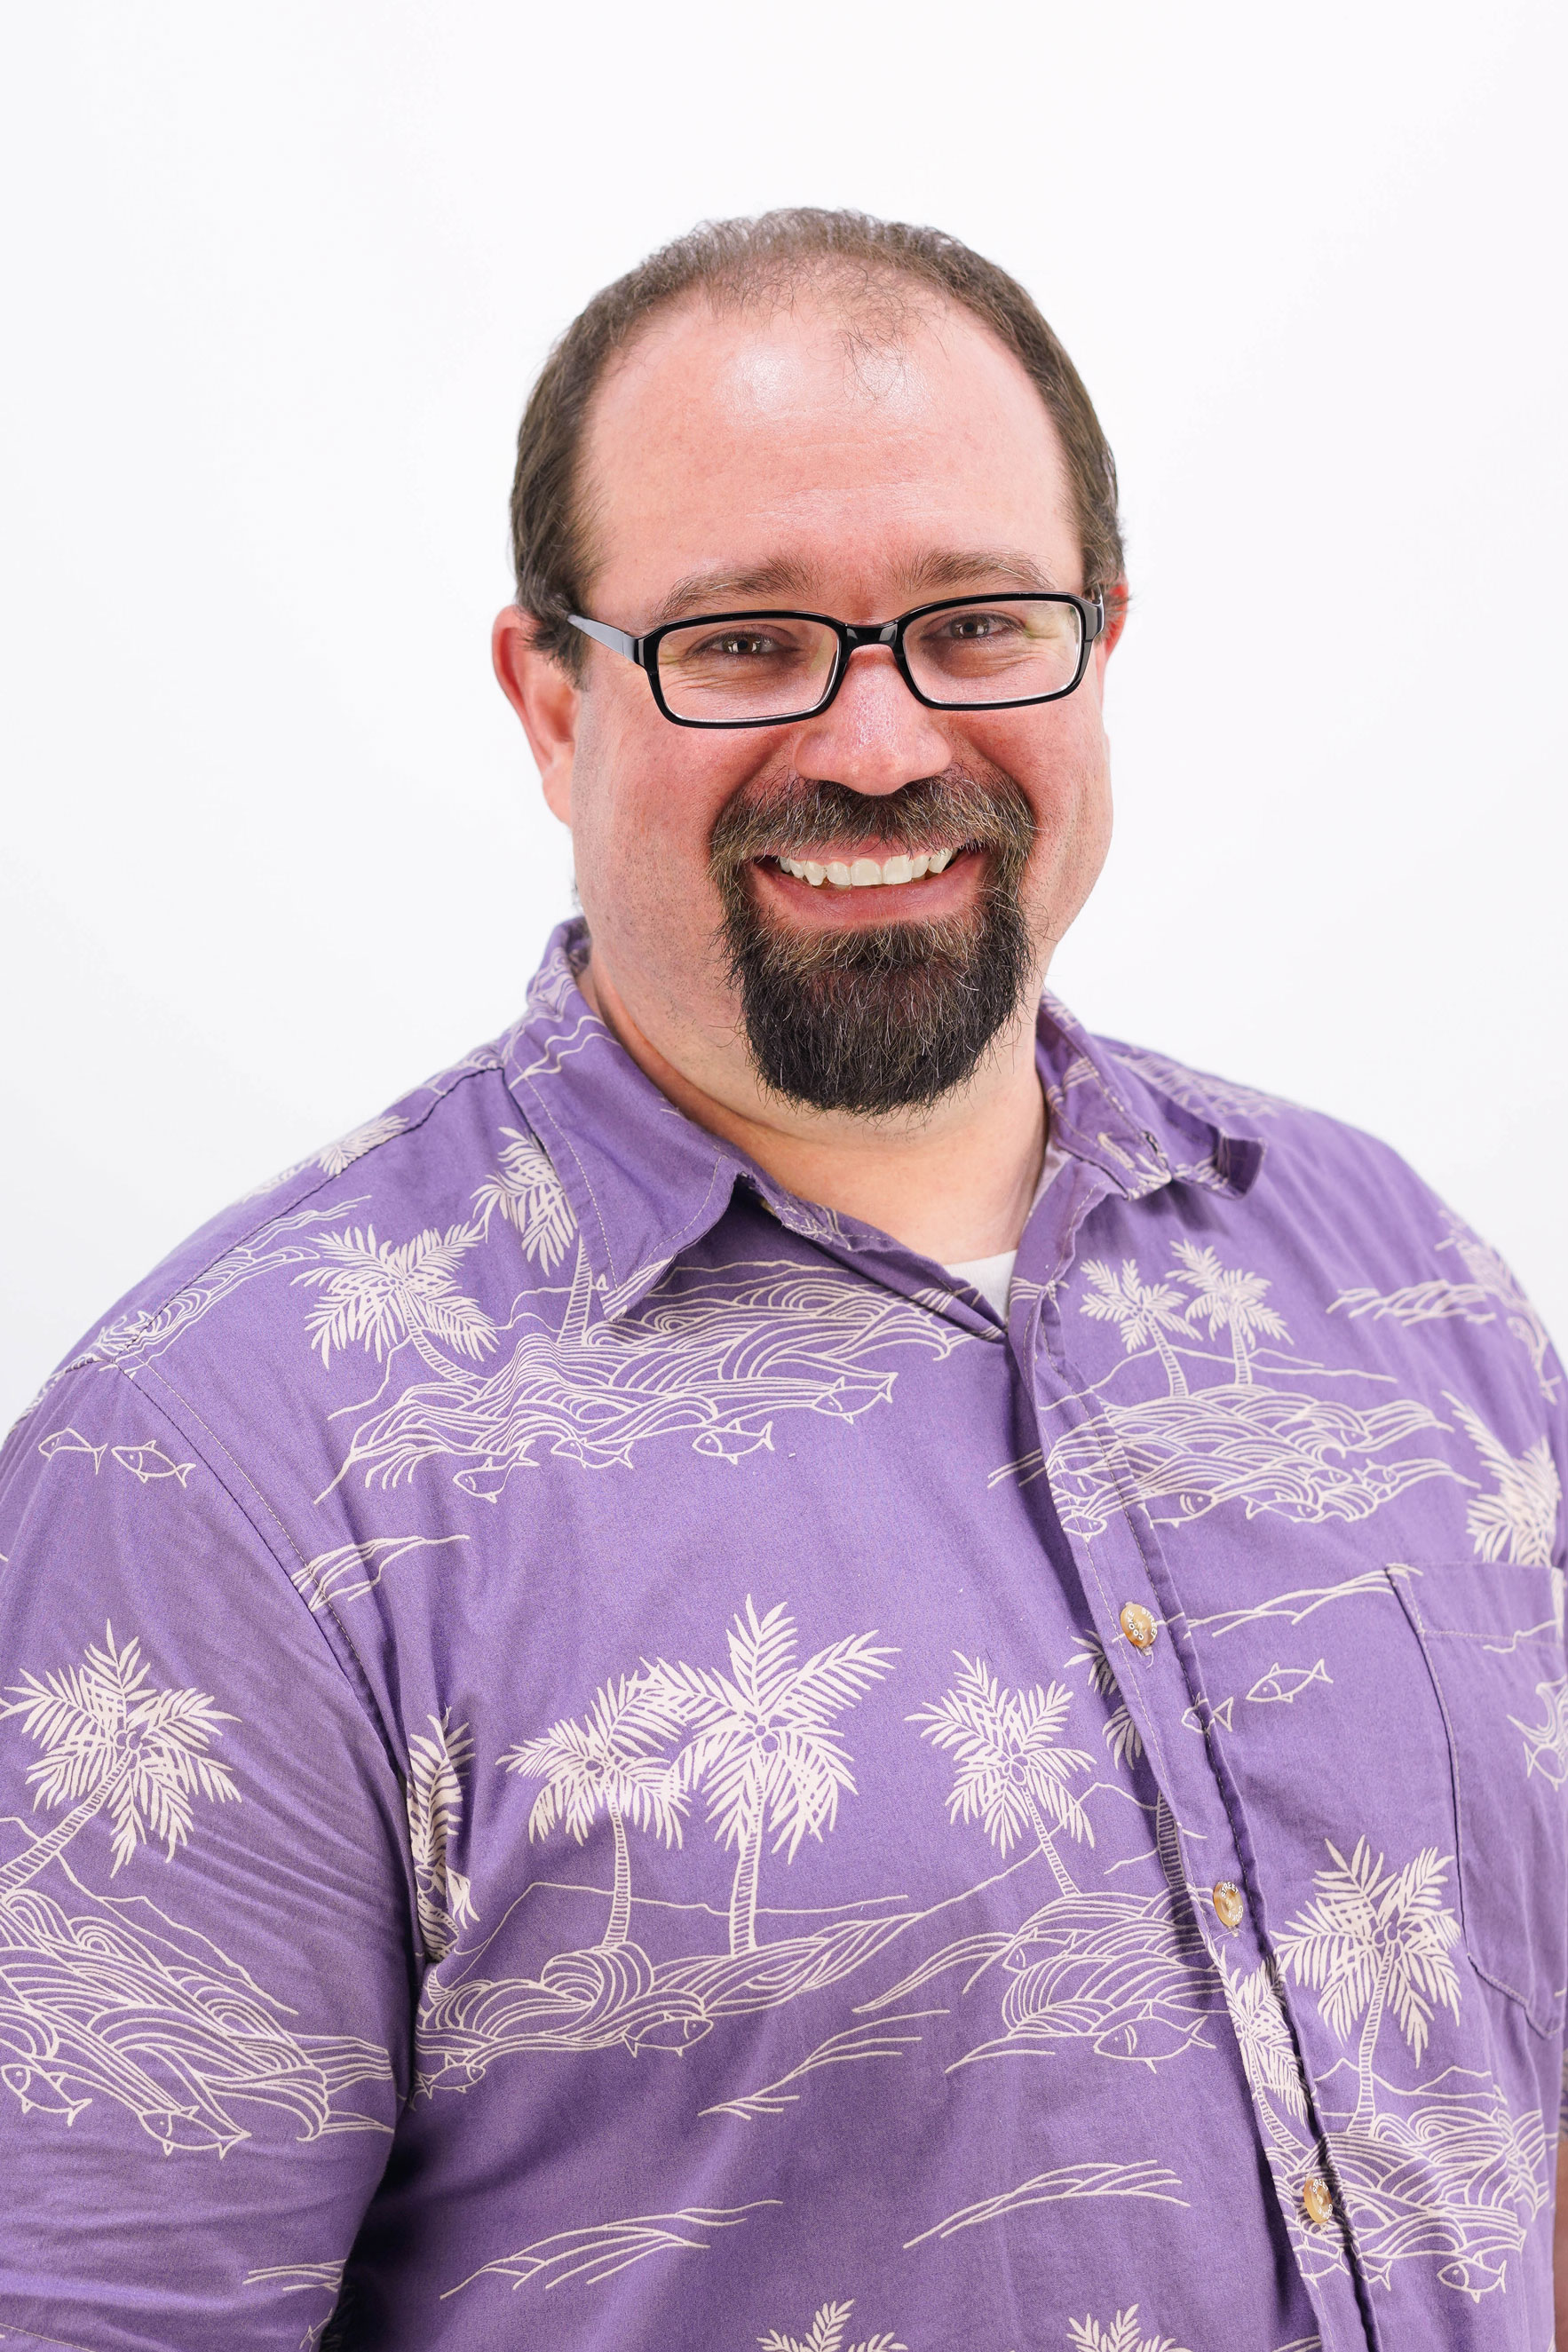 Dr. Garret ClaytonMechatronicsProfessor of Mechatronics Villanova University,Robot Guru -